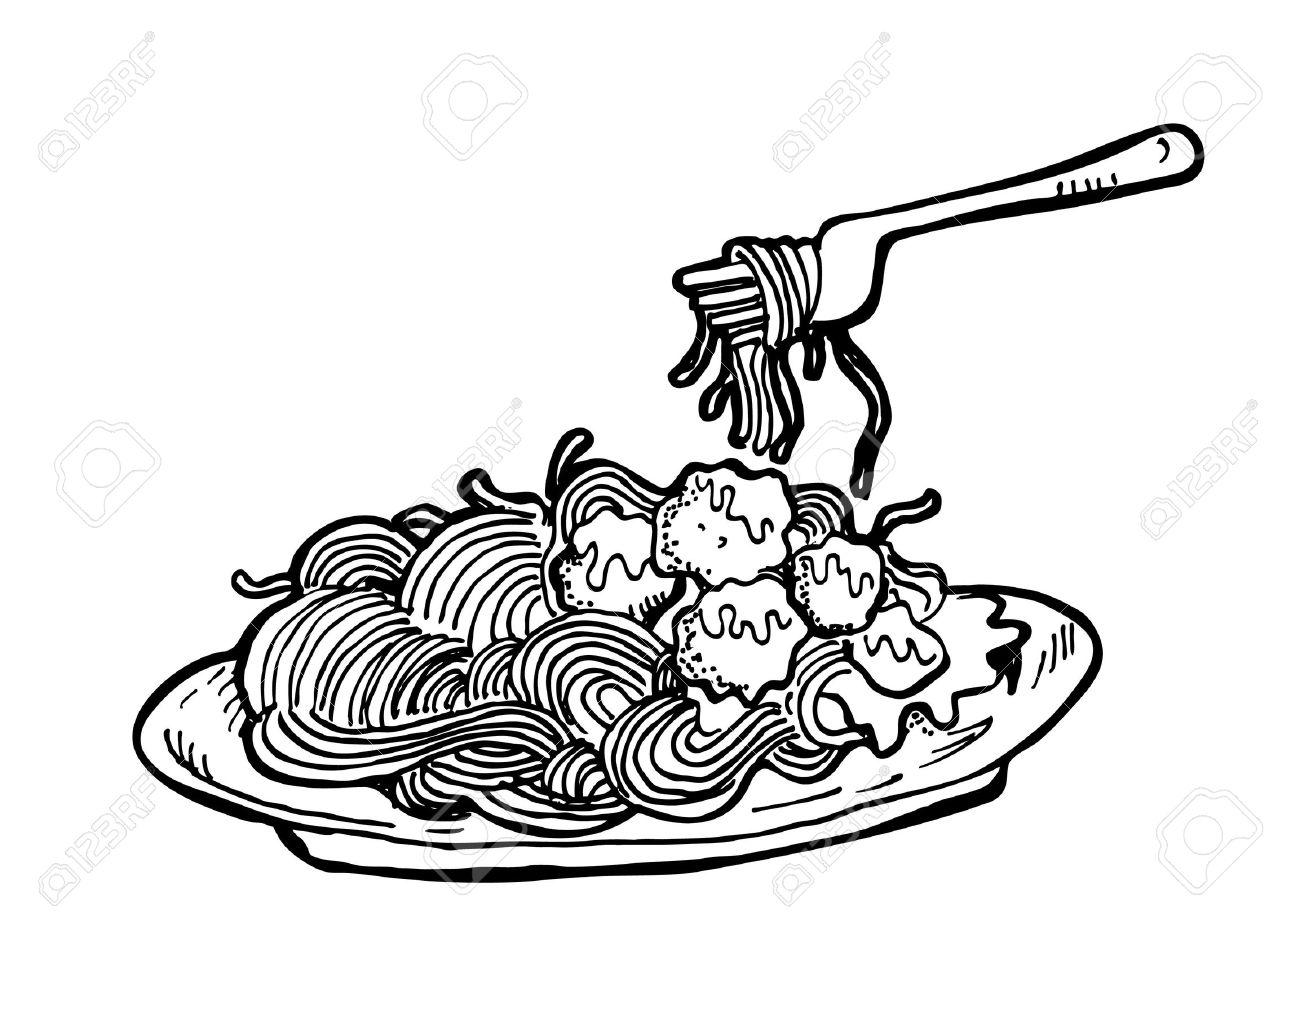 Spaghetti clipart black and white 9 » Clipart Station.